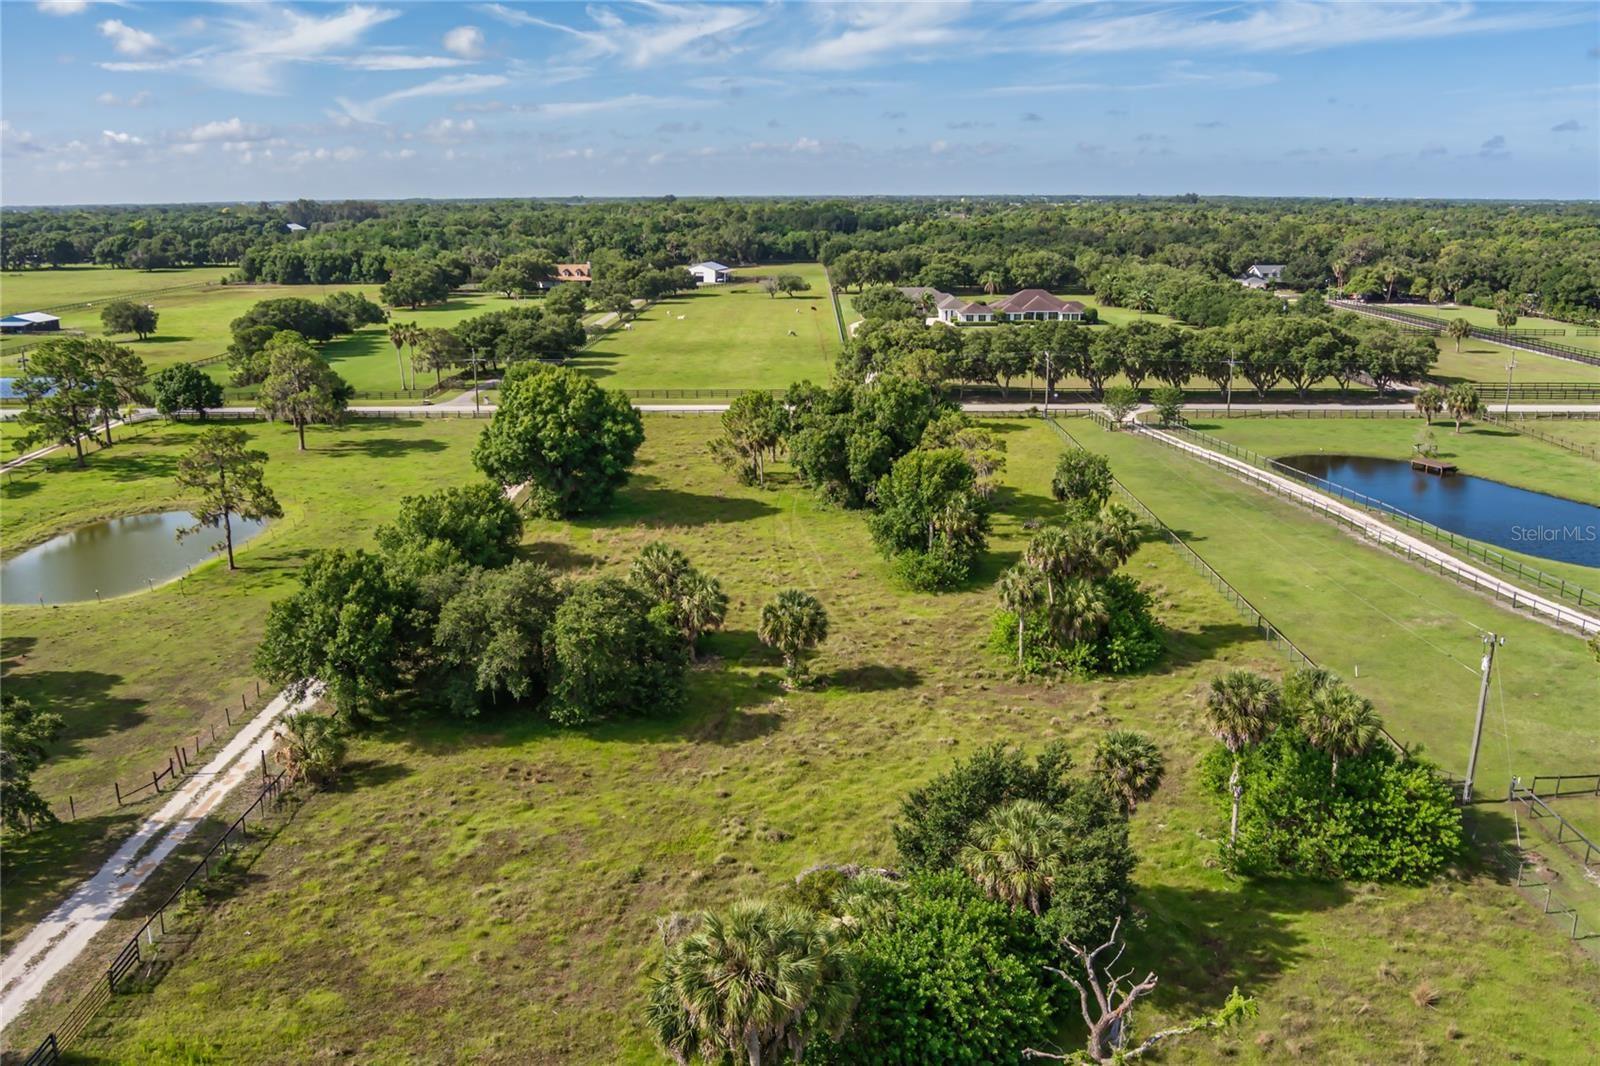 Photo of 15535 WATERLINE ROAD, BRADENTON, FL 34212 (MLS # A4503551)